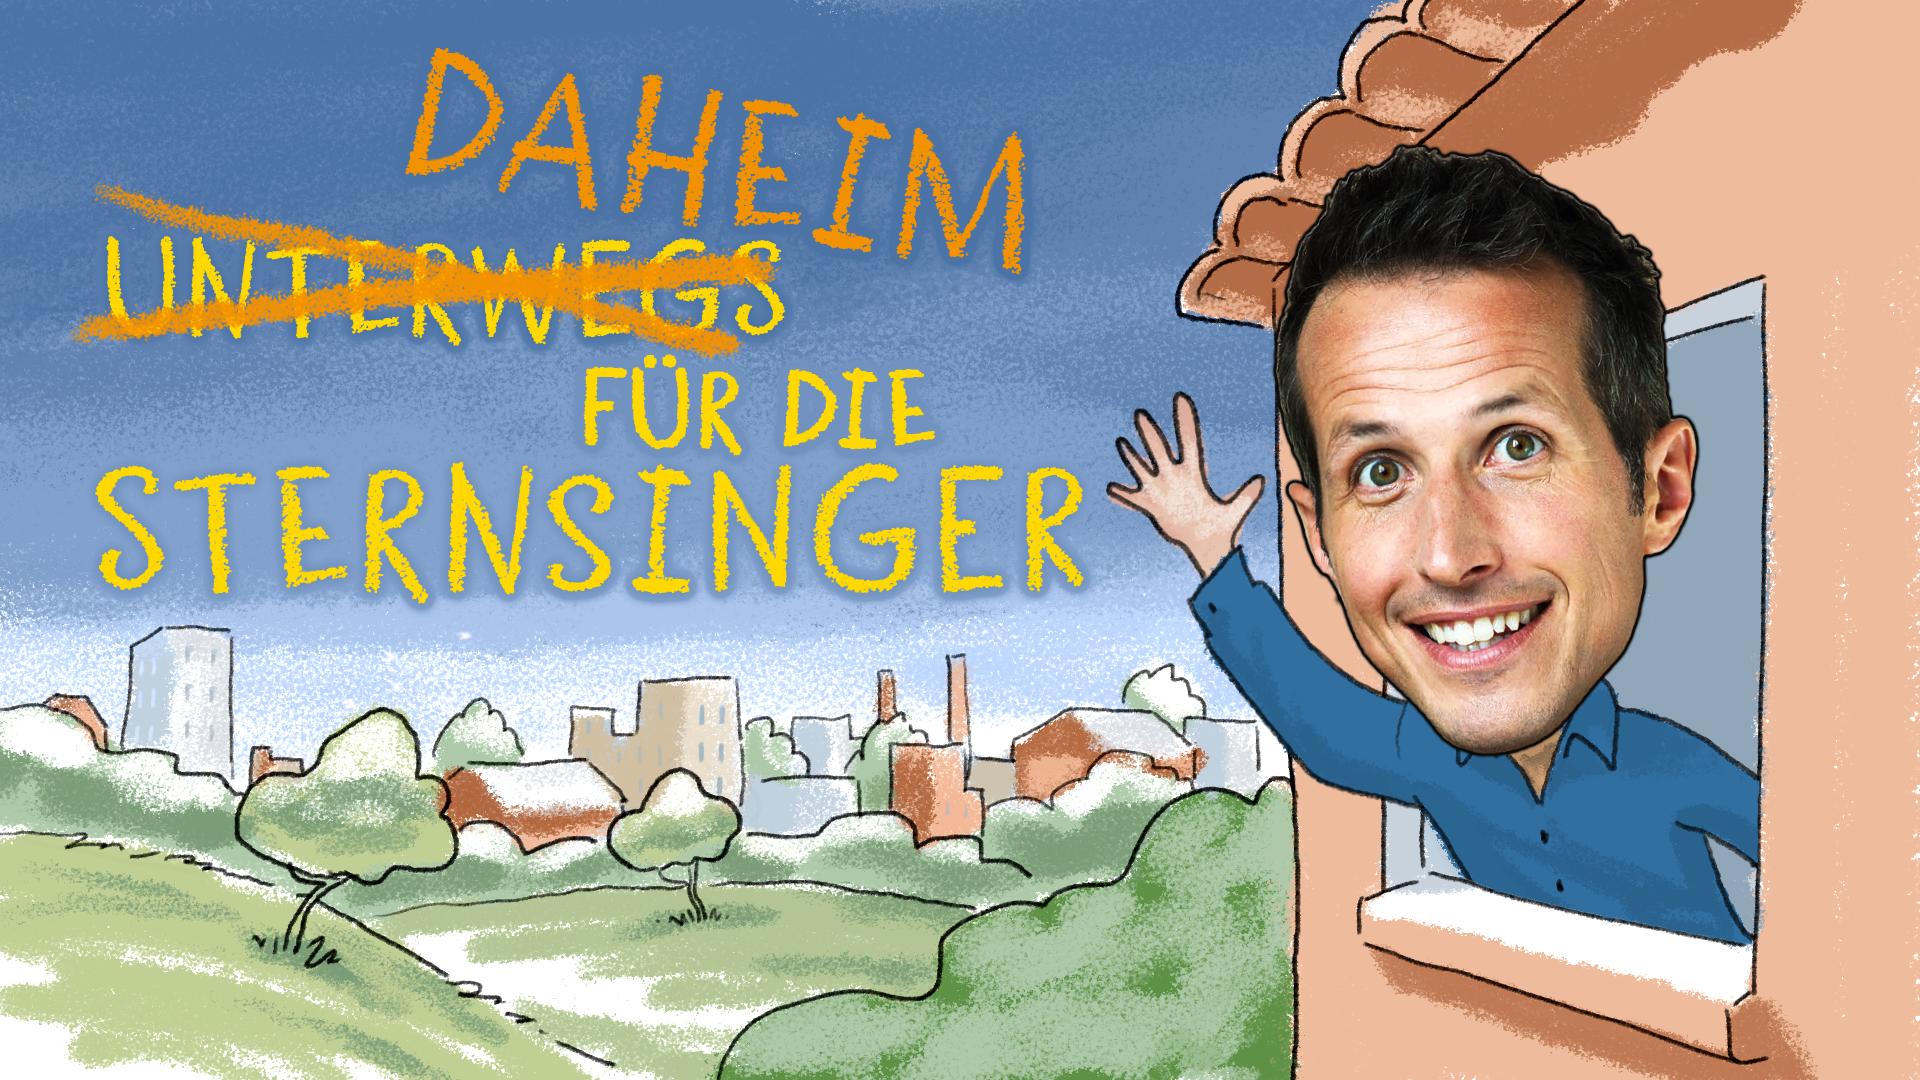 Willi daheim